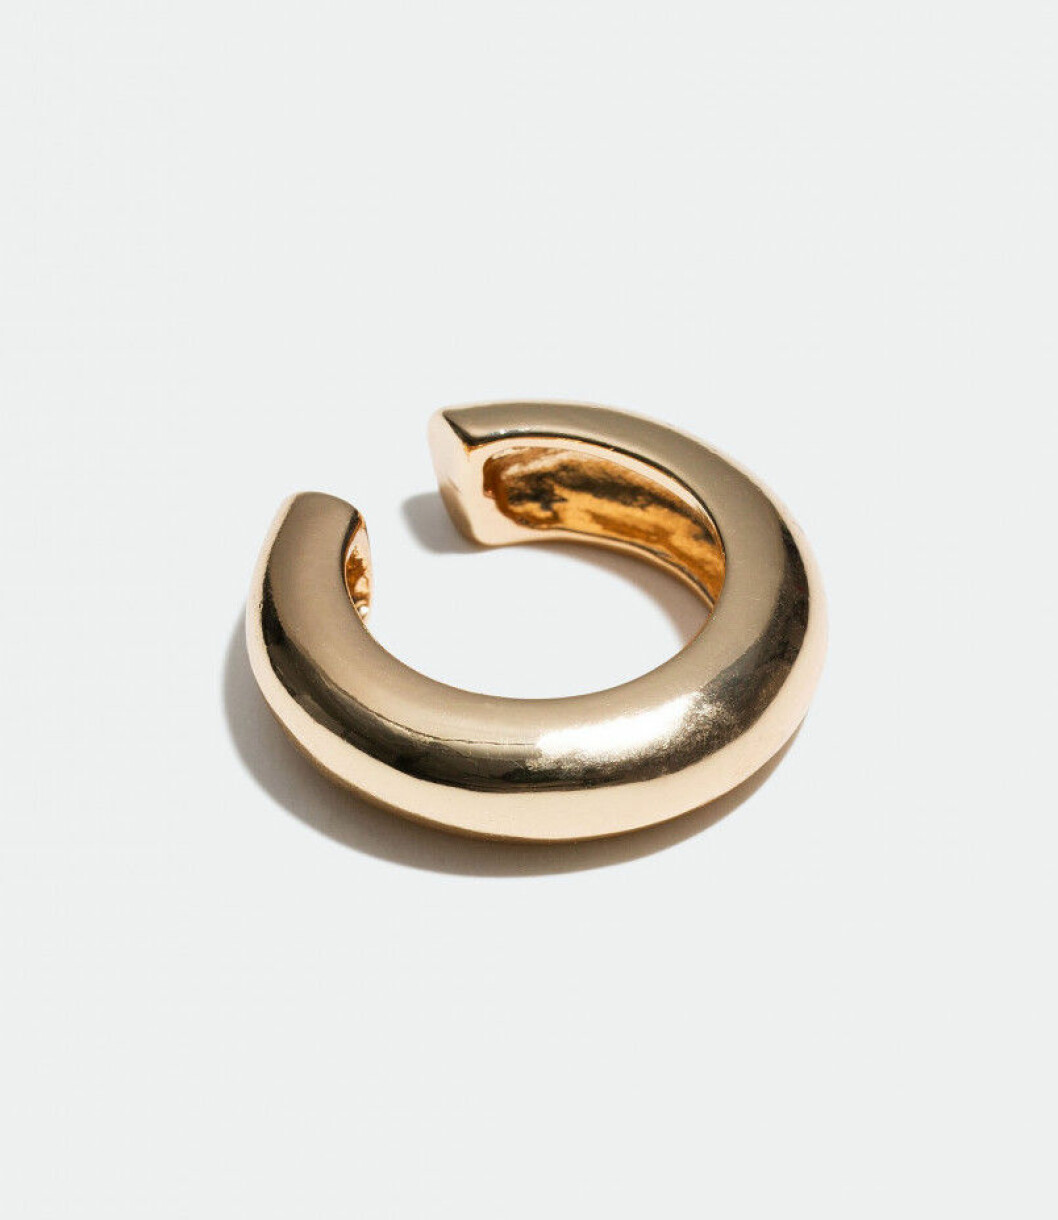 Guldfärgad, stilren earcuff från Glitter